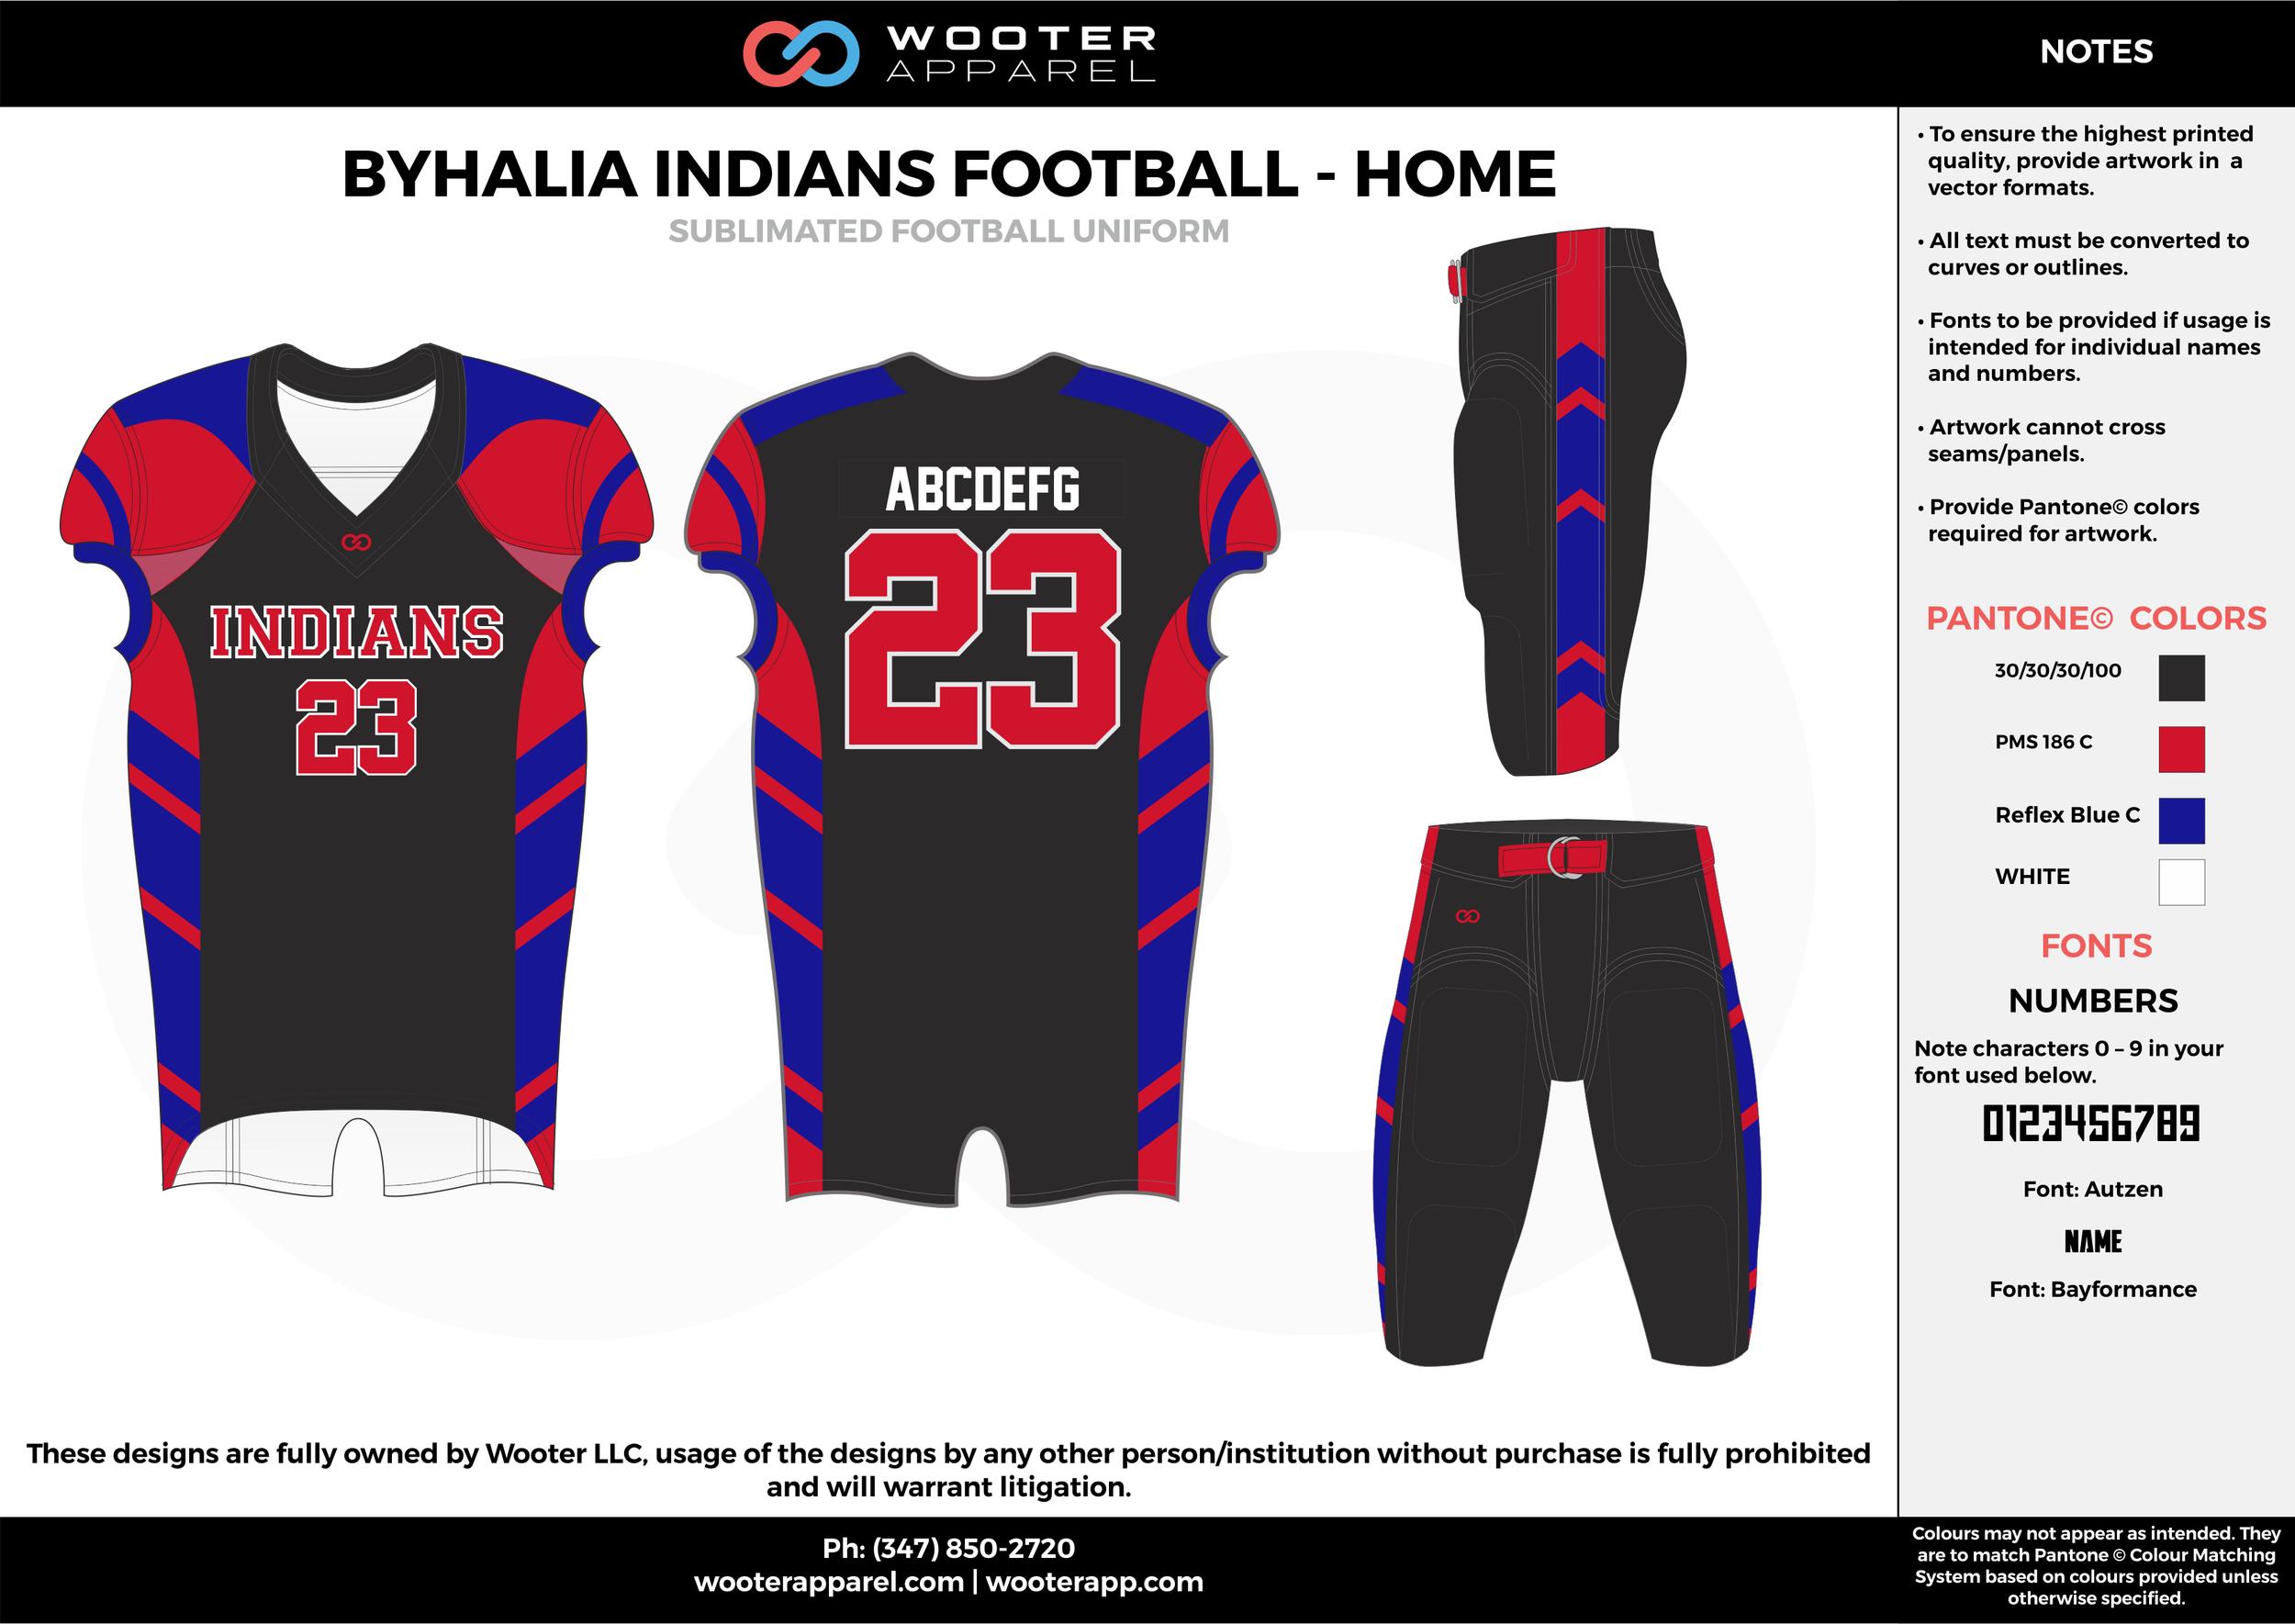 BYHALIA INDIANS FOOTBALL - HOME black red blue white football uniforms jerseys pants